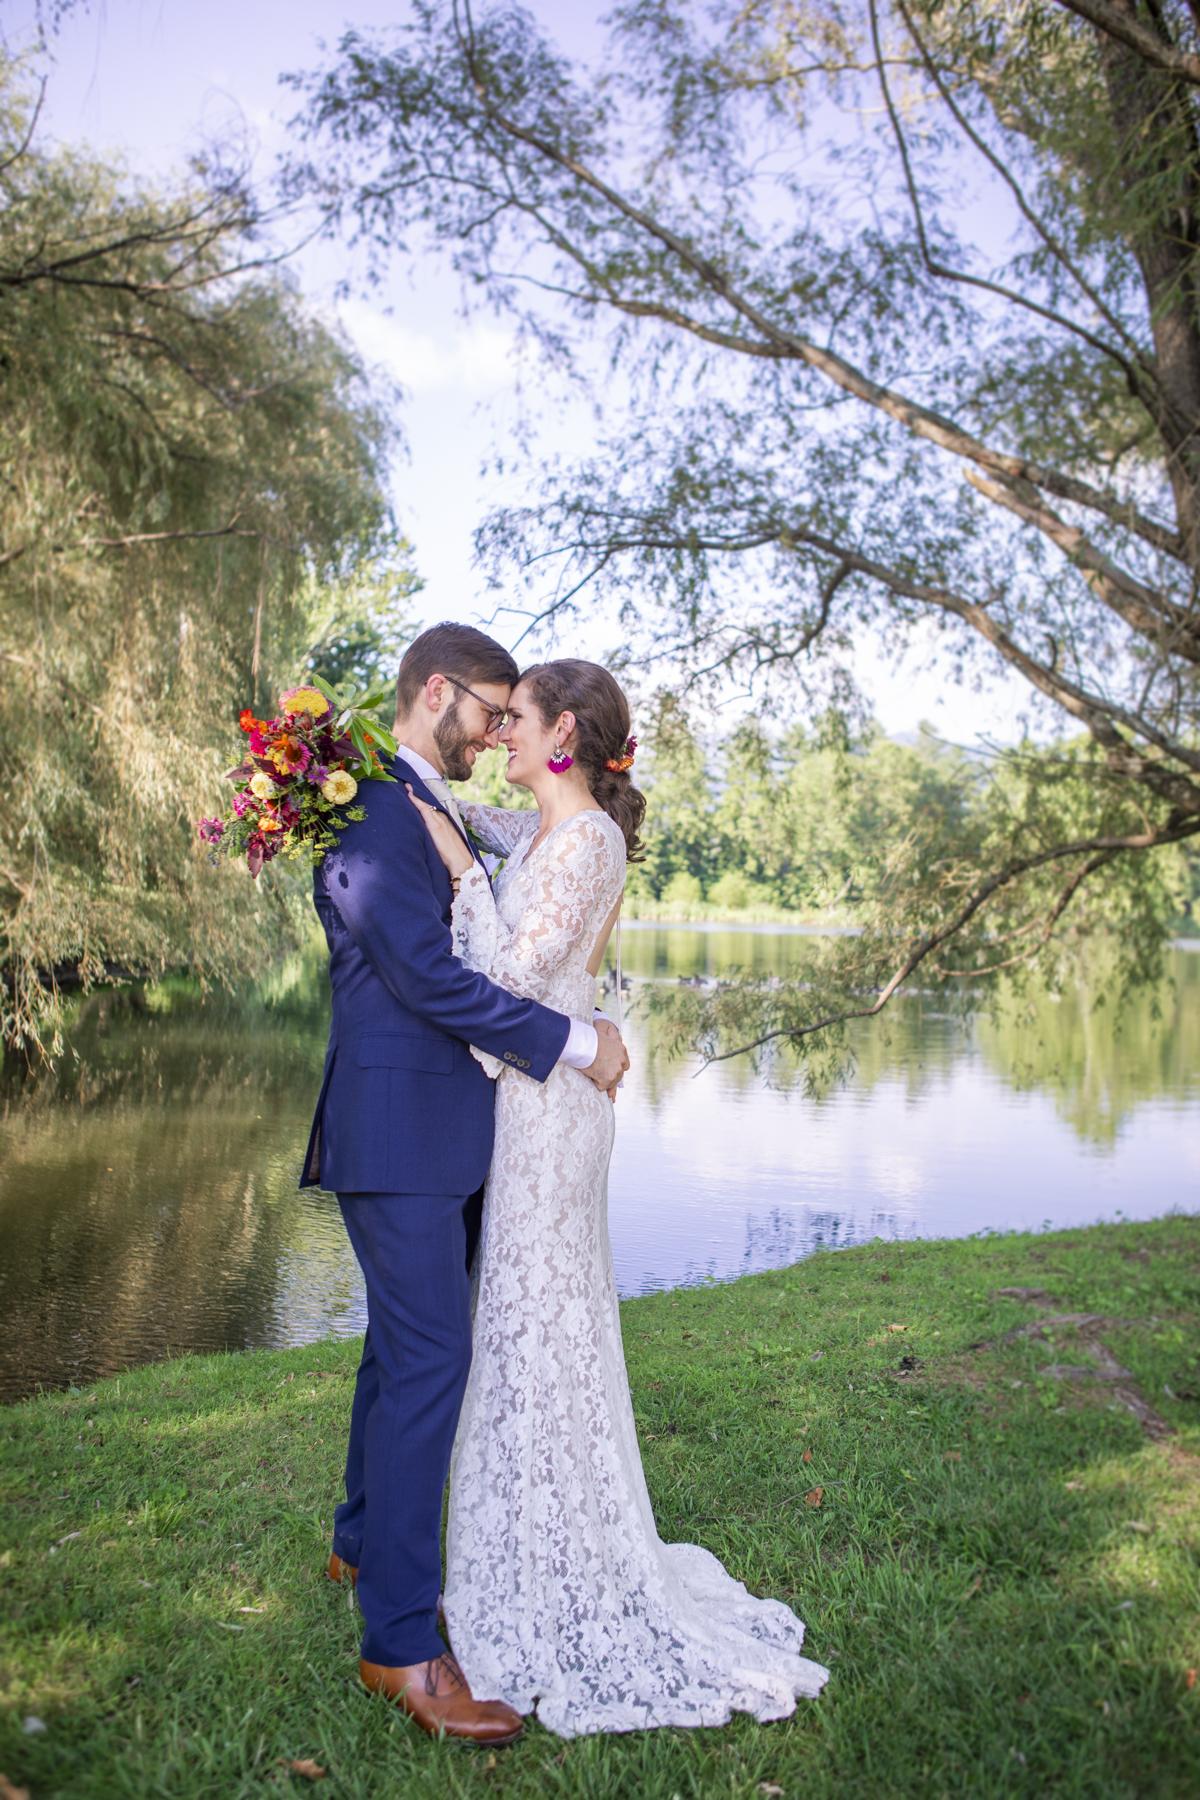 Aimee and Bryan Wedding Anniversary_photos by Studio Misha -3.jpg